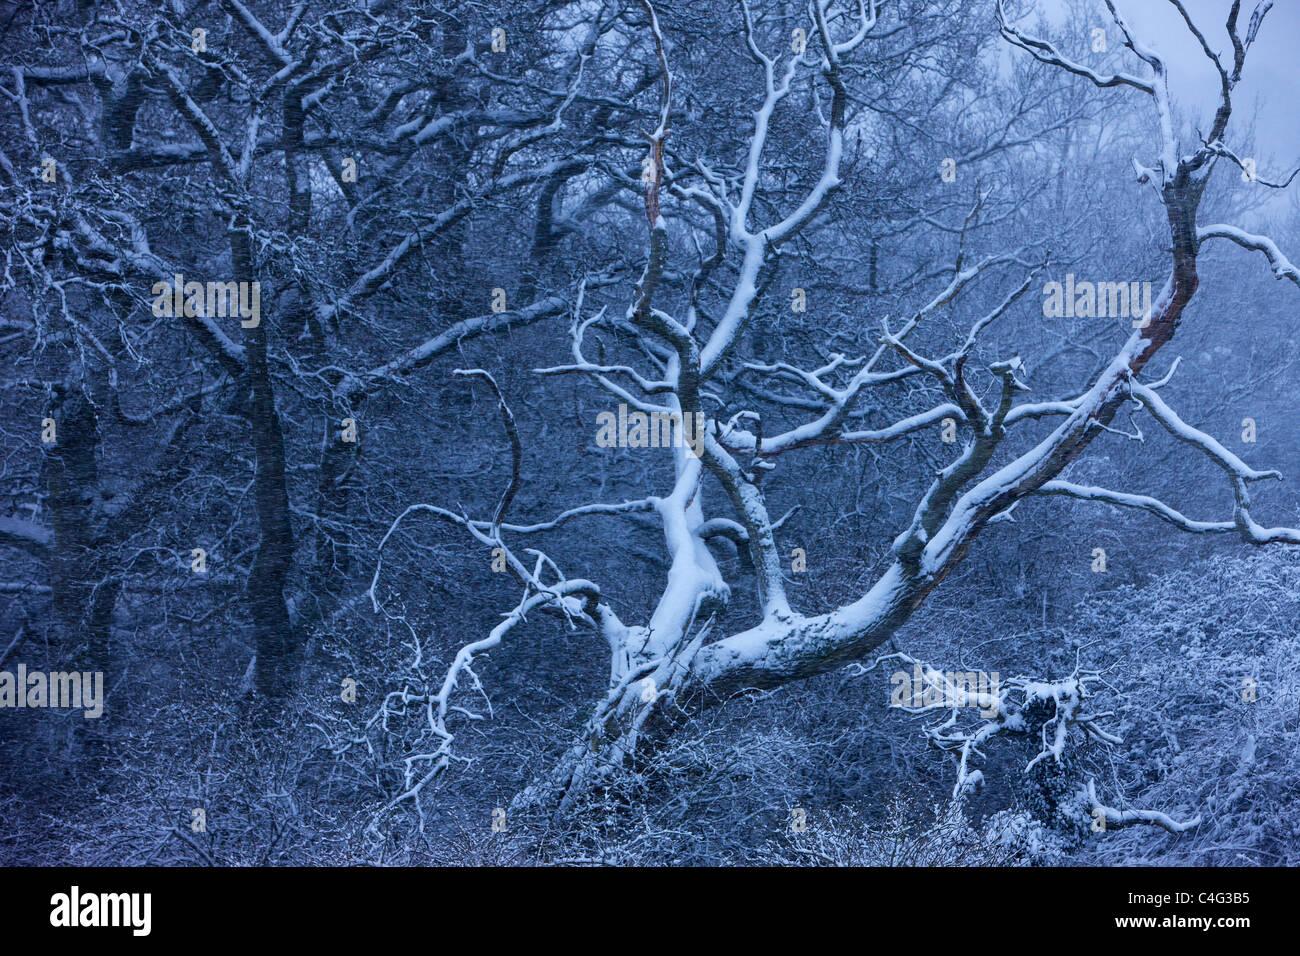 Schnee auf den Bäumen am Cadbury Castle, Somerset, England Stockbild